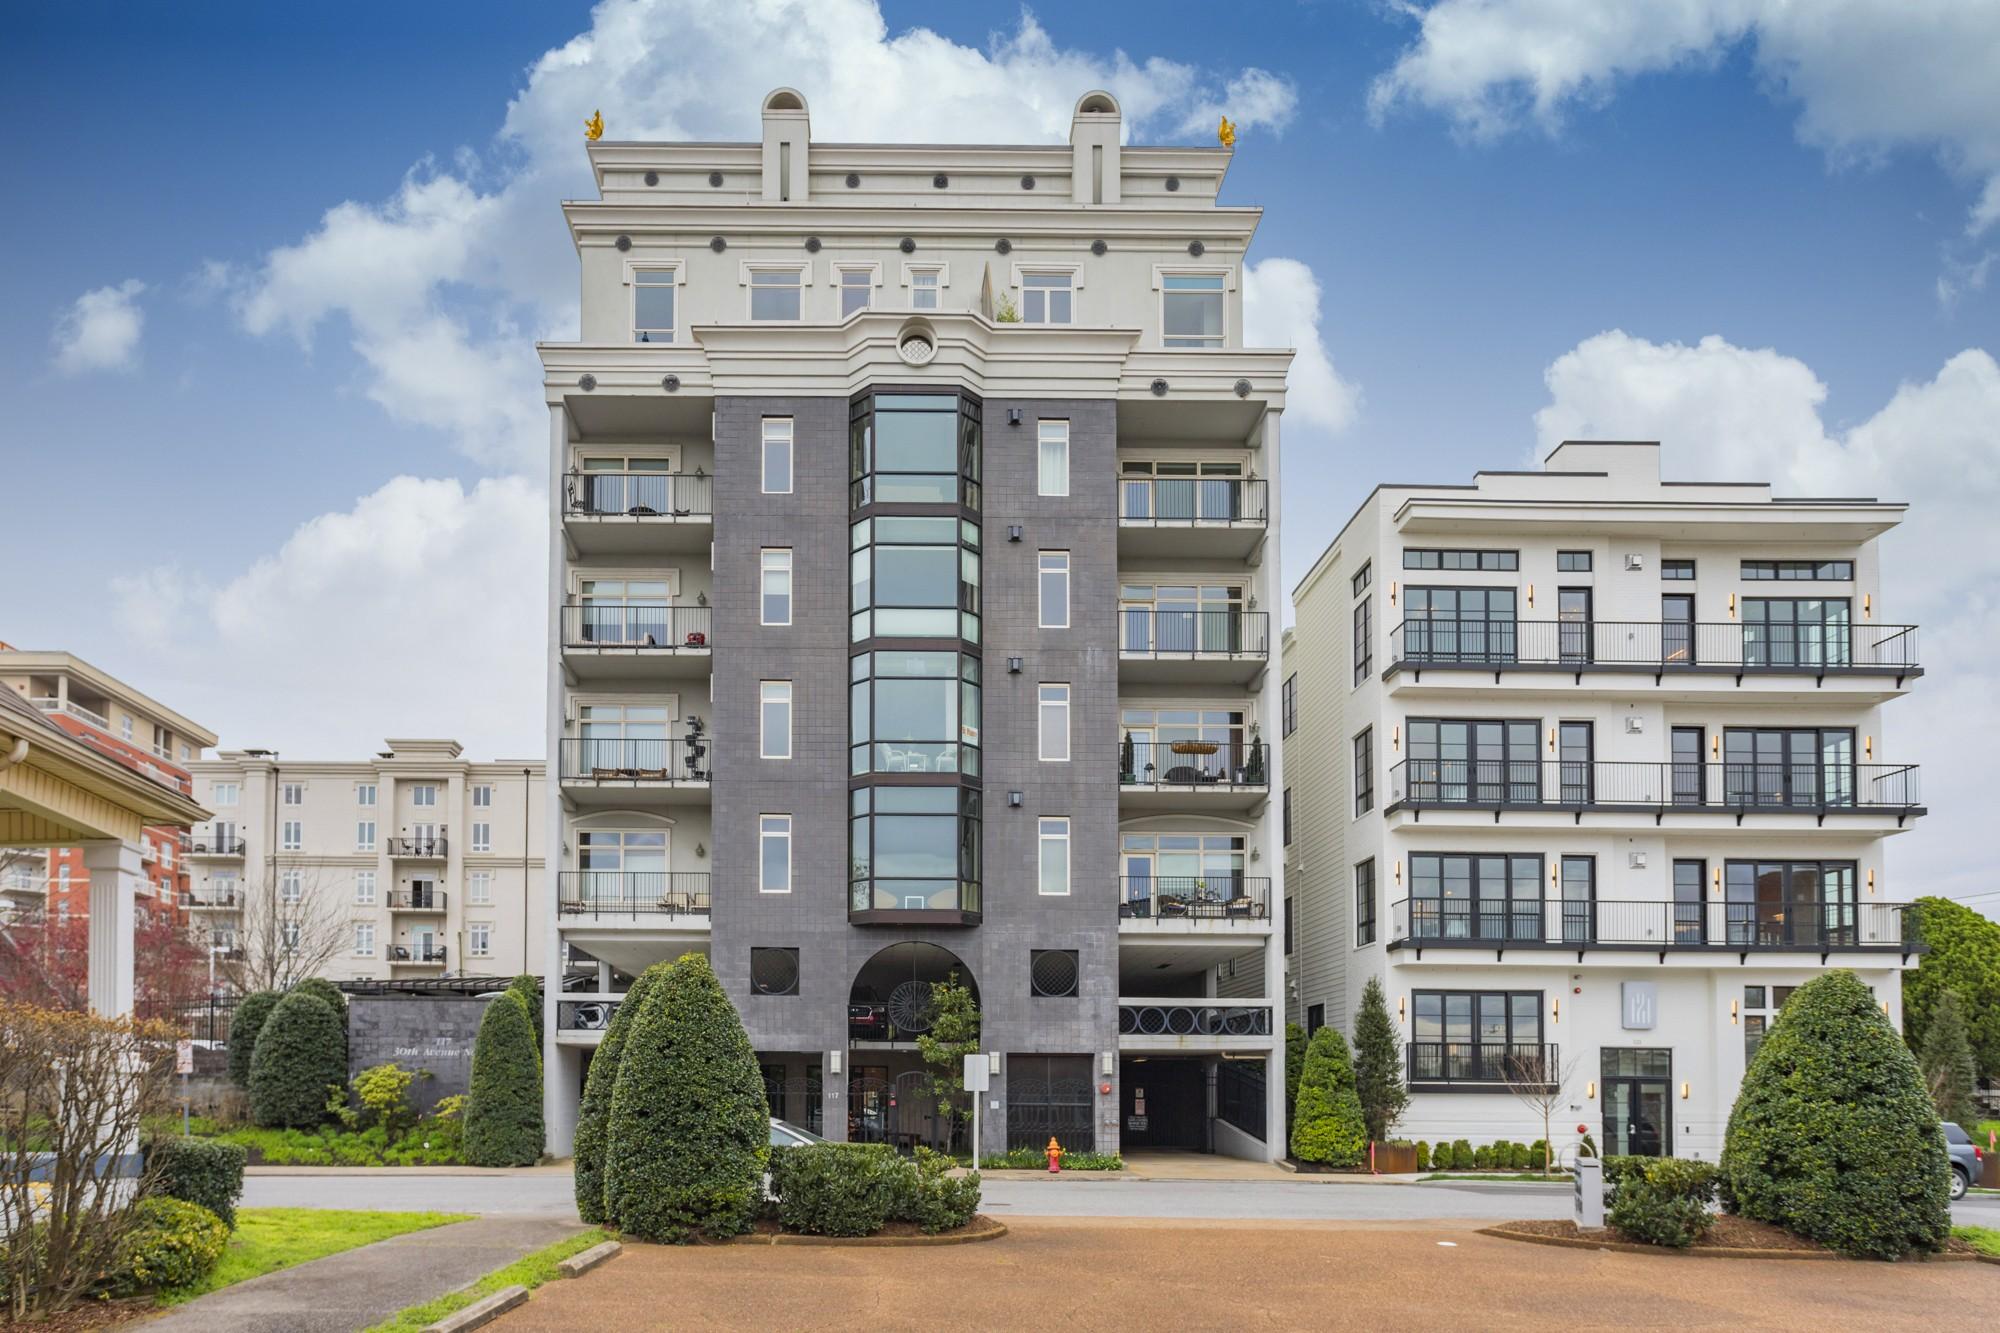 117 30th Ave, N, Nashville, TN 37203 - Nashville, TN real estate listing